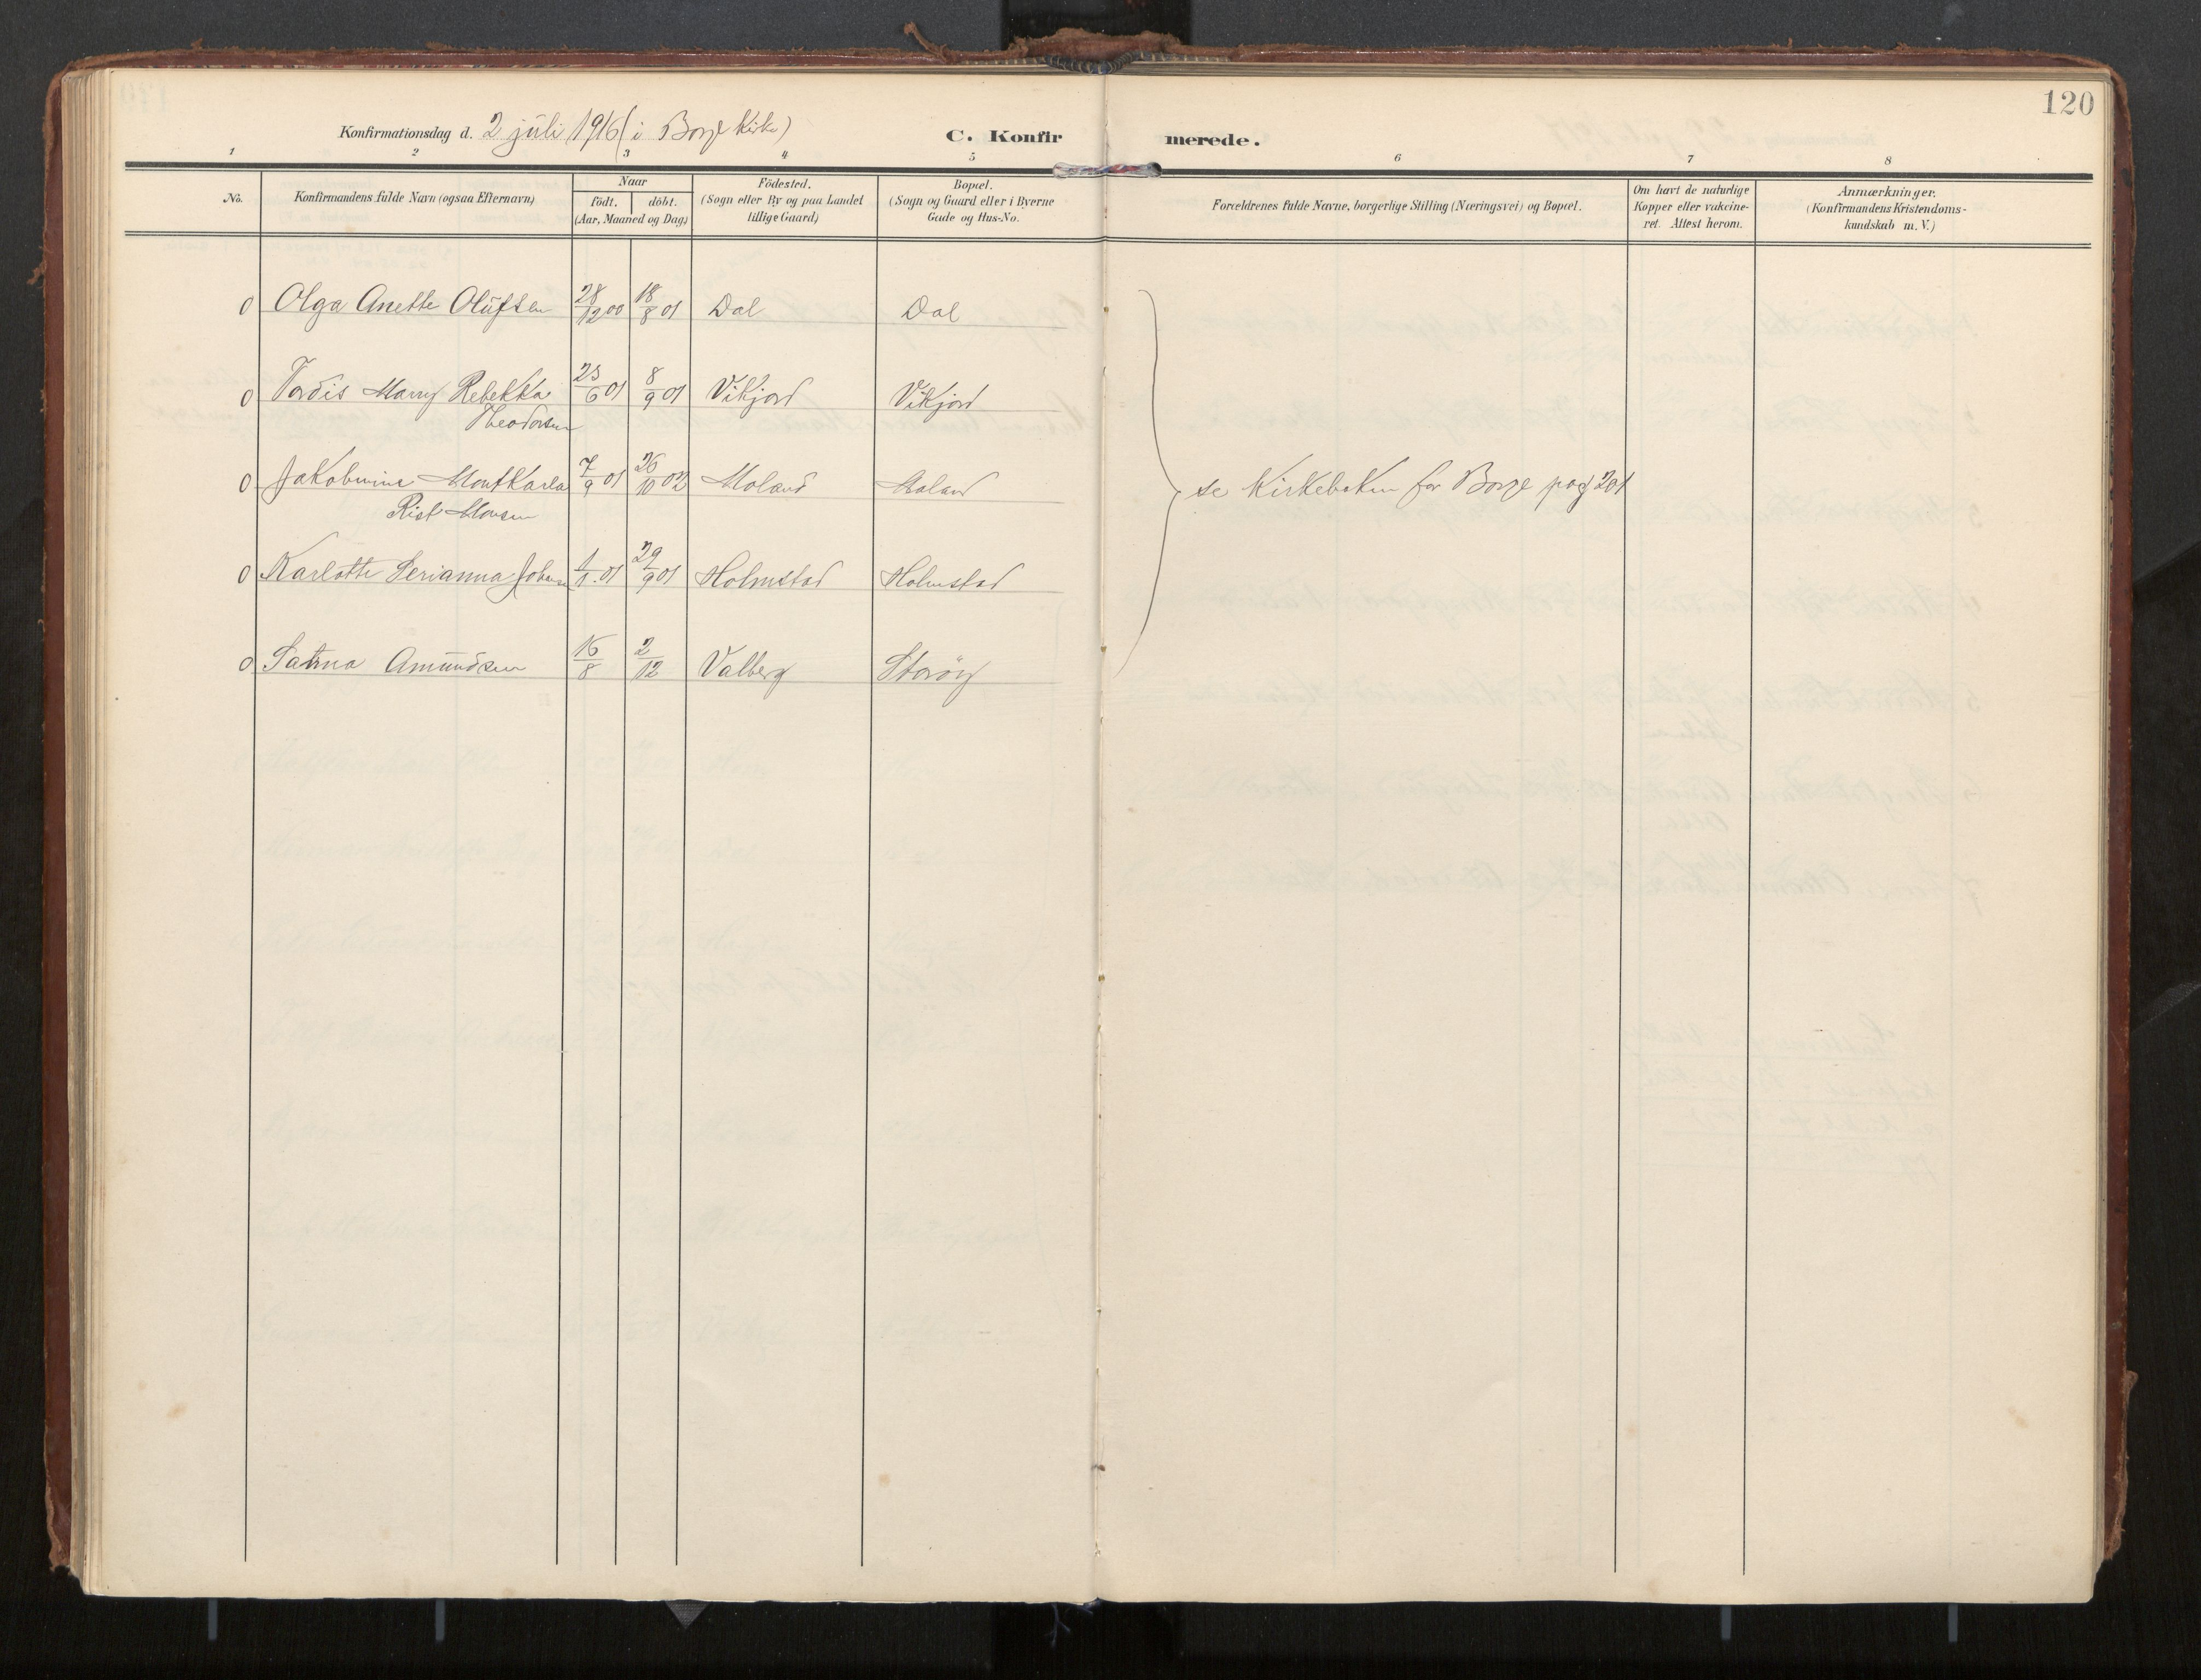 SAT, Ministerialprotokoller, klokkerbøker og fødselsregistre - Nordland, 884/L1194: Ministerialbok nr. 884A02, 1906-1937, s. 120